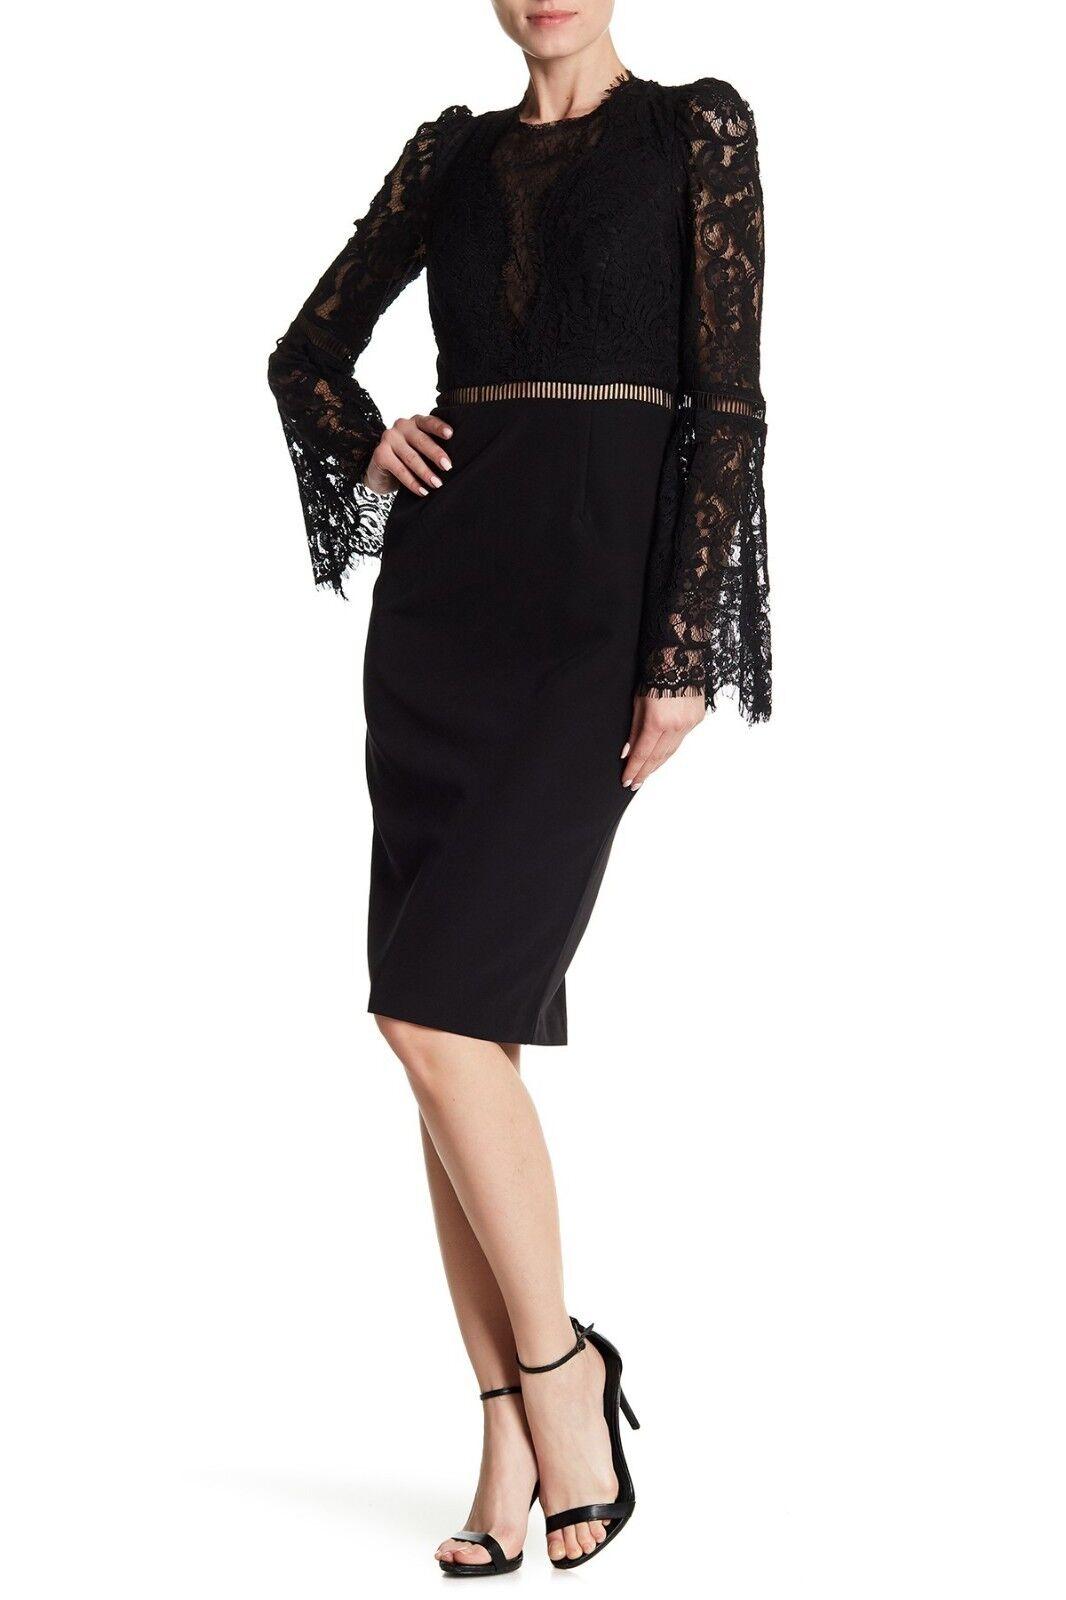 NWT Bardot Lace Bodice Bell Sleeve Eyelet Cocktail dress schwarz Sz 4 XS NWT